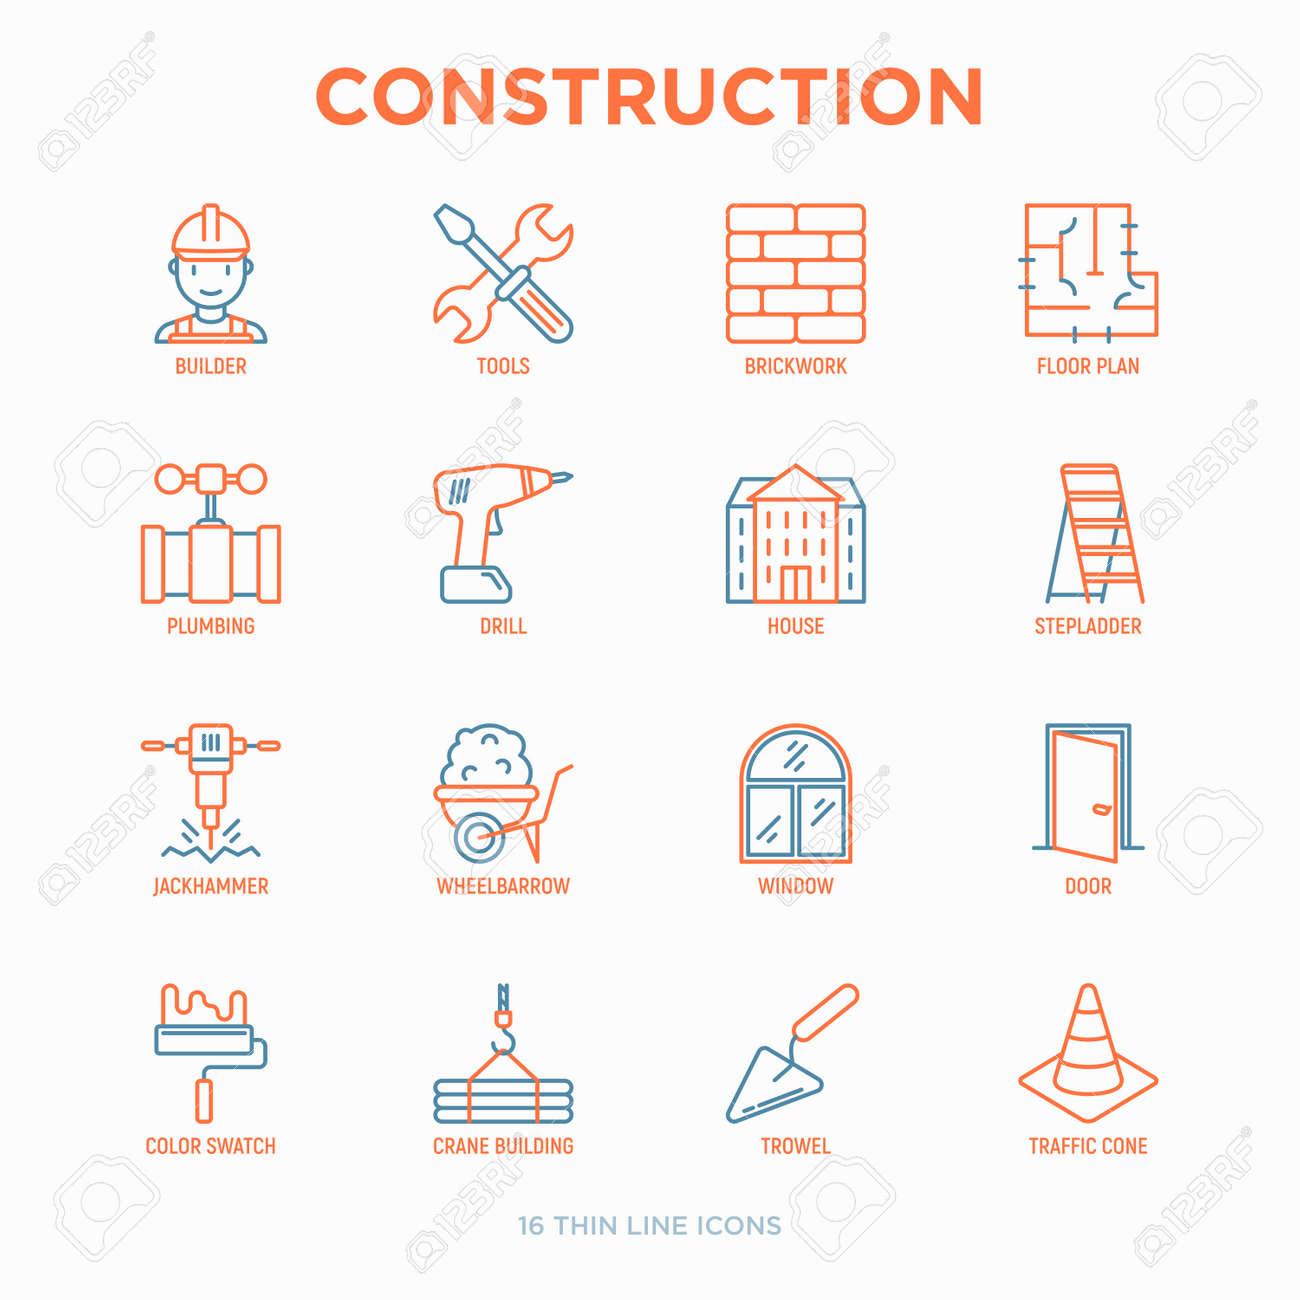 Construction thin line icons set: builder in helmet, work tools, brickwork, floor plan, plumbing, drill, trowel, traffic cone, building, stepladder, jackhammer, wheelbarrow. Vector illustration. - 128881303